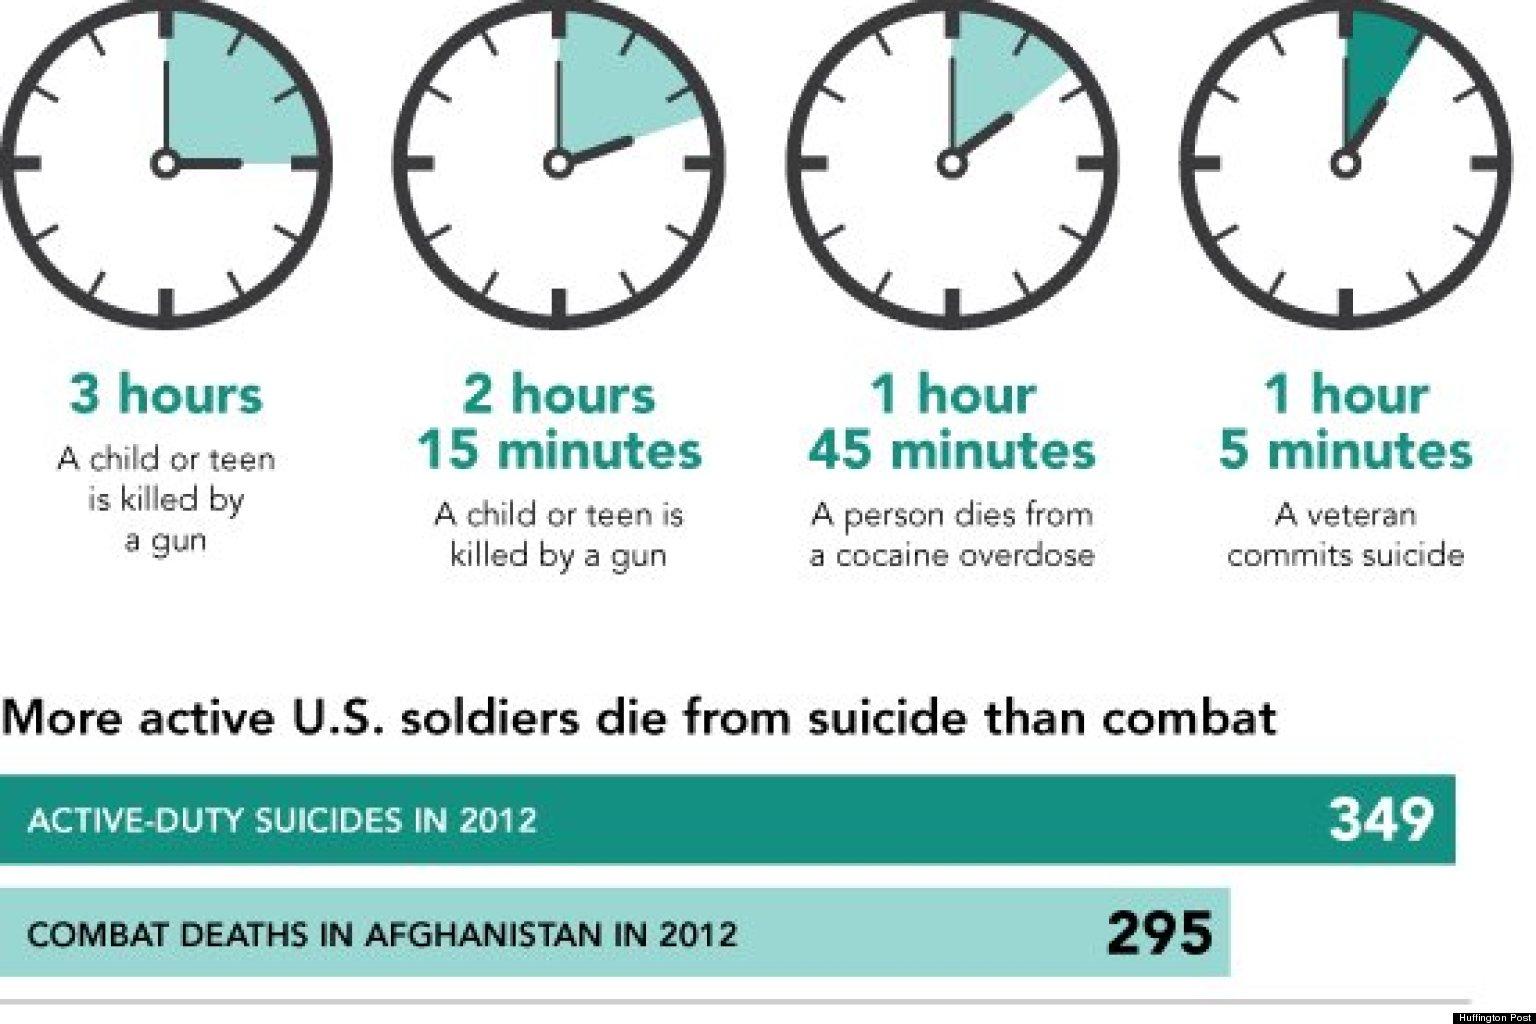 http://i.huffpost.com/gen/1156477/thumbs/o-VETERAN-SUICIDES-facebook.jpg